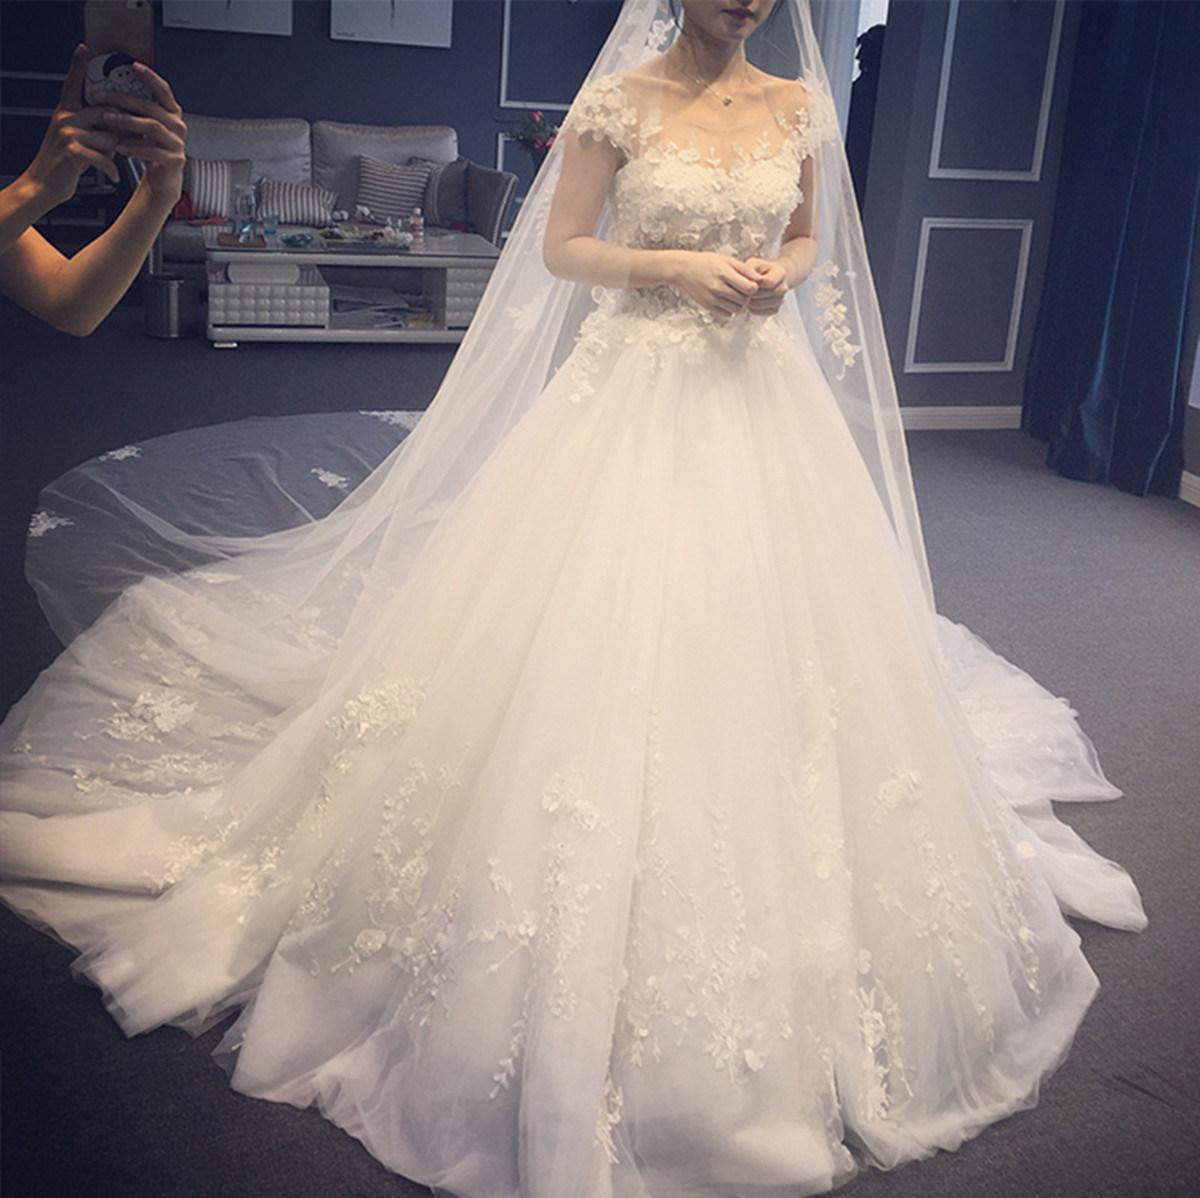 2017 Elegant Princess Bateau Bow Waist Wedding Dress (Dream-100063)